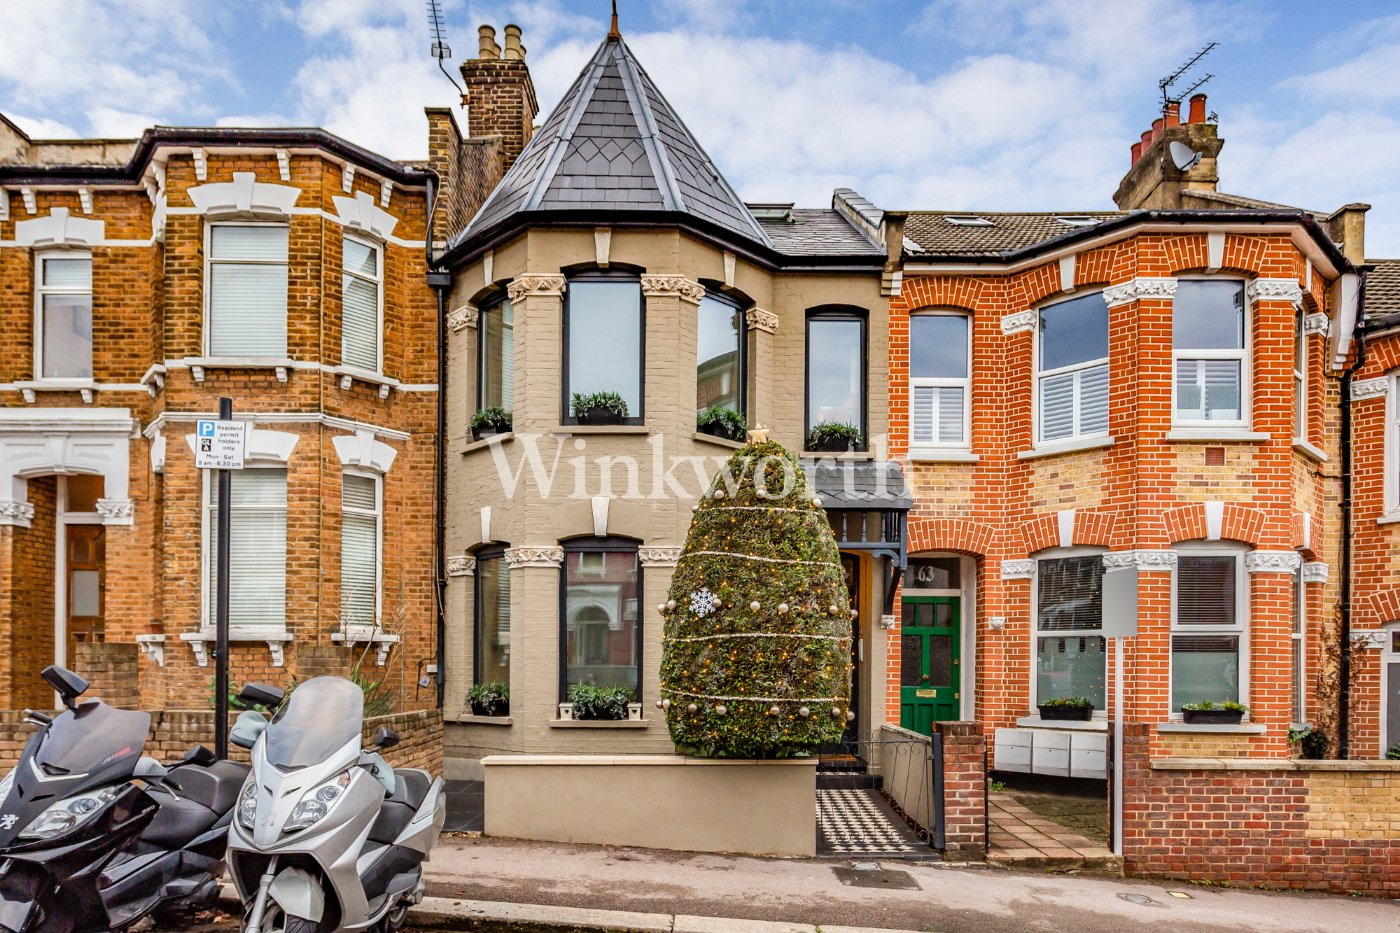 5 bed terraced house for sale in Duckett Road, Harringay Ladder, London N4 - Zoopla